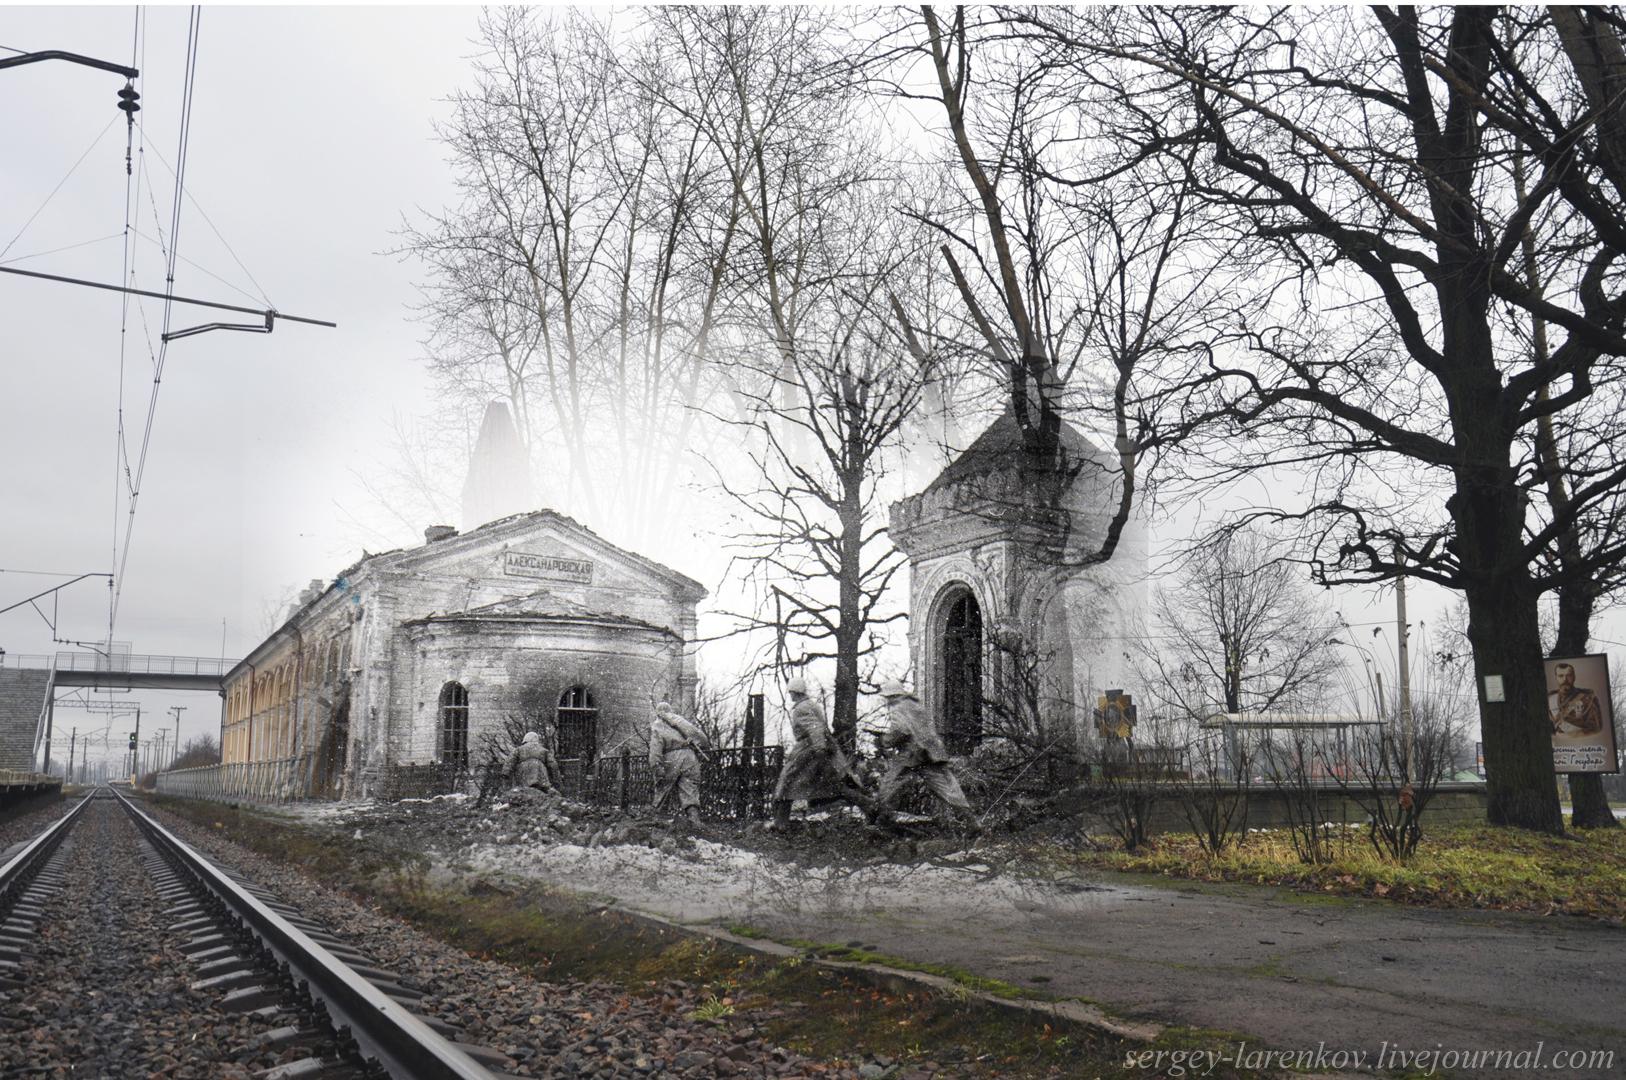 247.Пушкин 1944-2013. Советские пехотинцы выбивают противника со станции Александровская